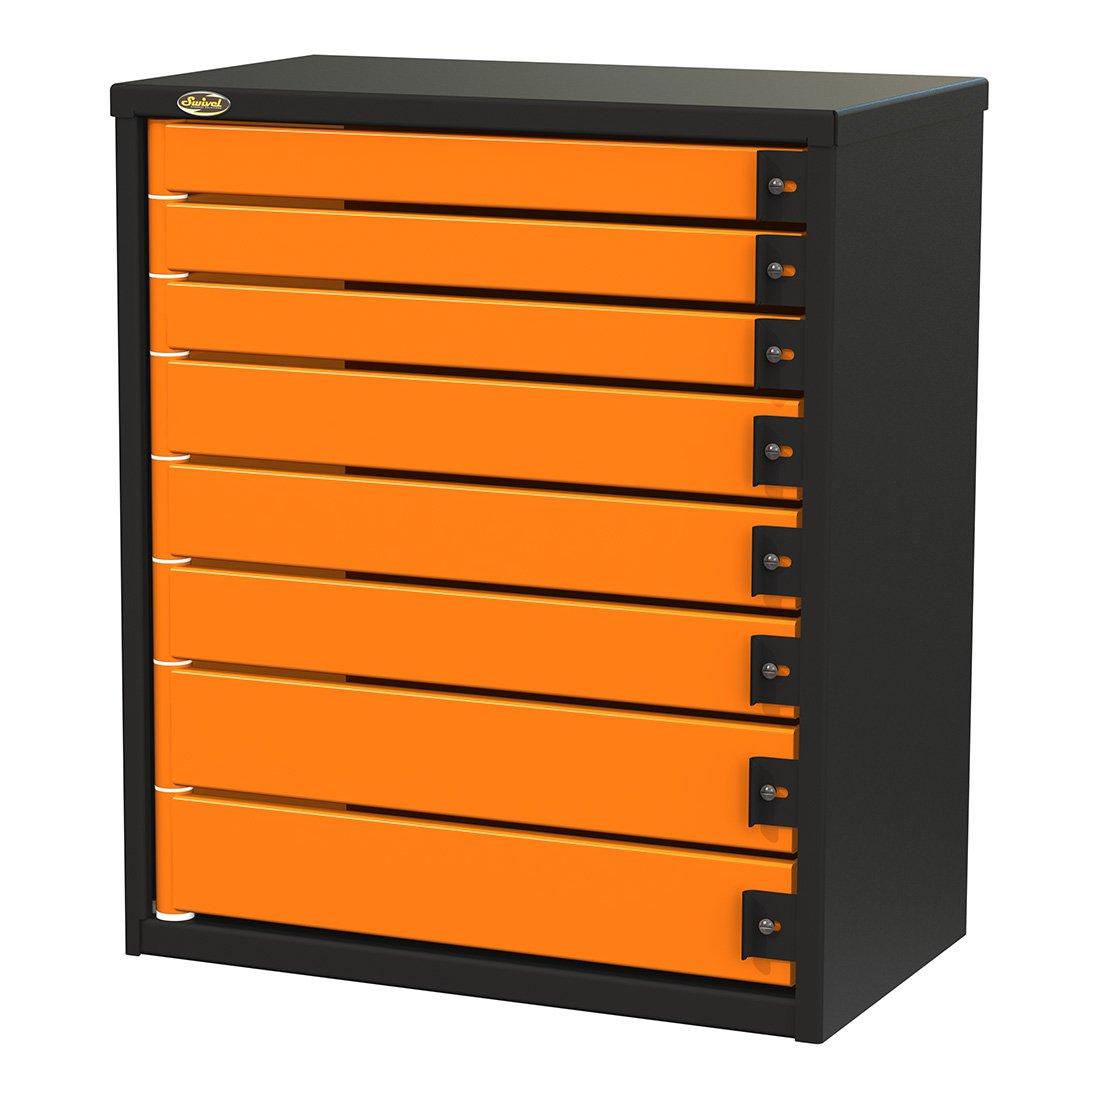 Swivel PRO343408 8-Drawer 30-Inch Service Tool Box